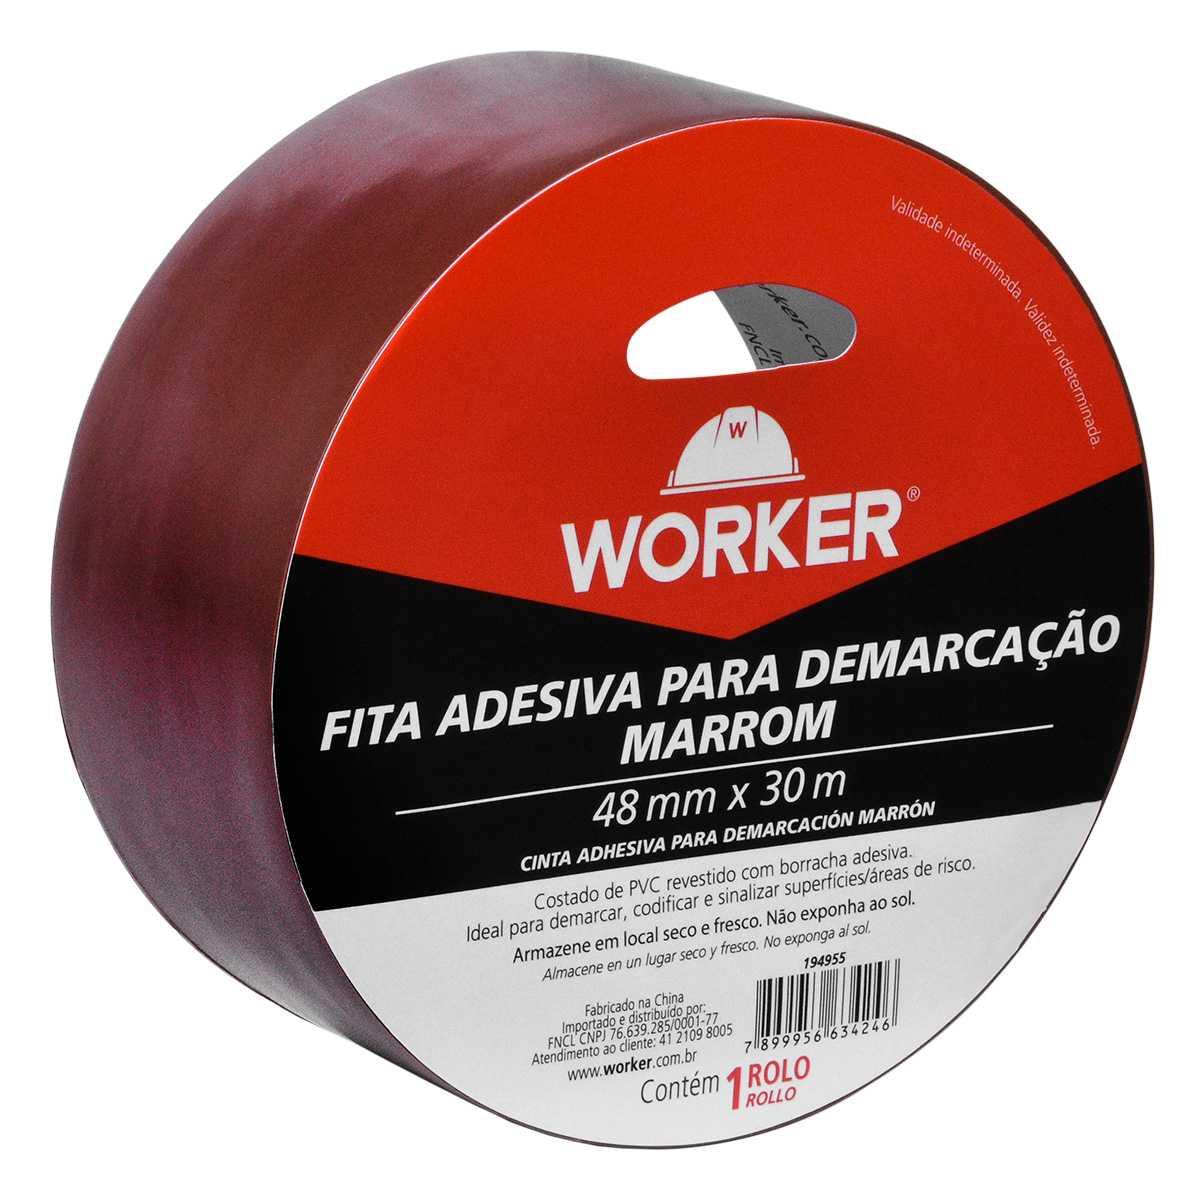 Fita Adesiva para Demarcação Marrom 48Mm X 30M Worker